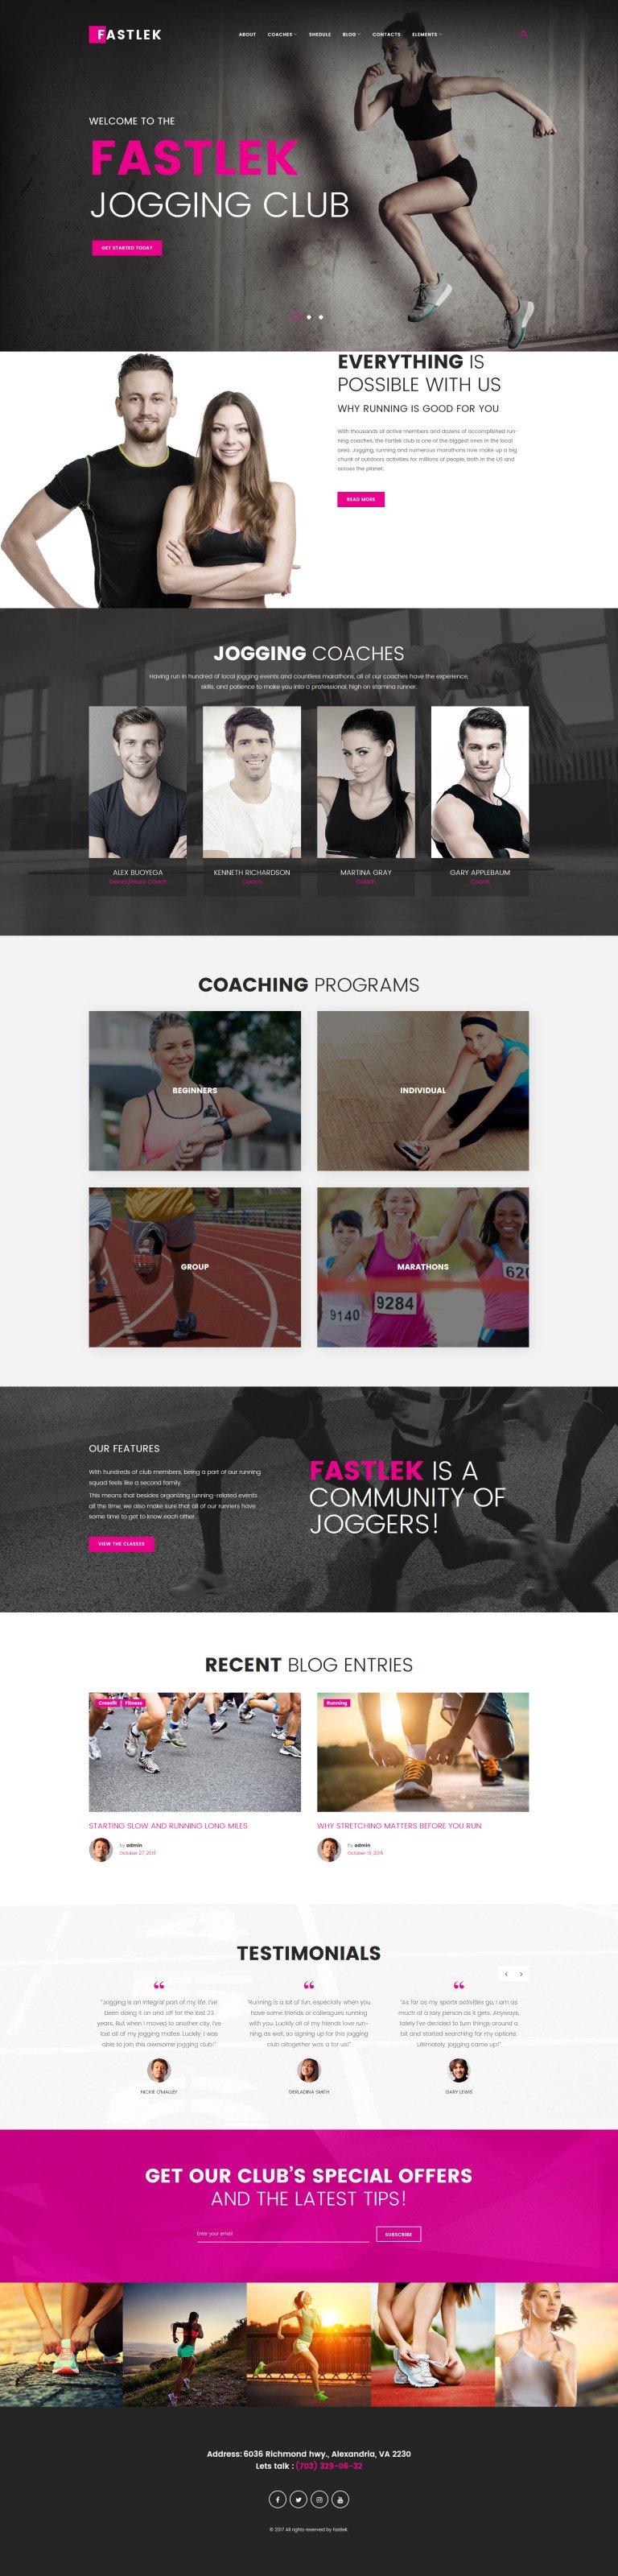 Fastlek - Running Club & Coaching WordPress Theme New Screenshots BIG